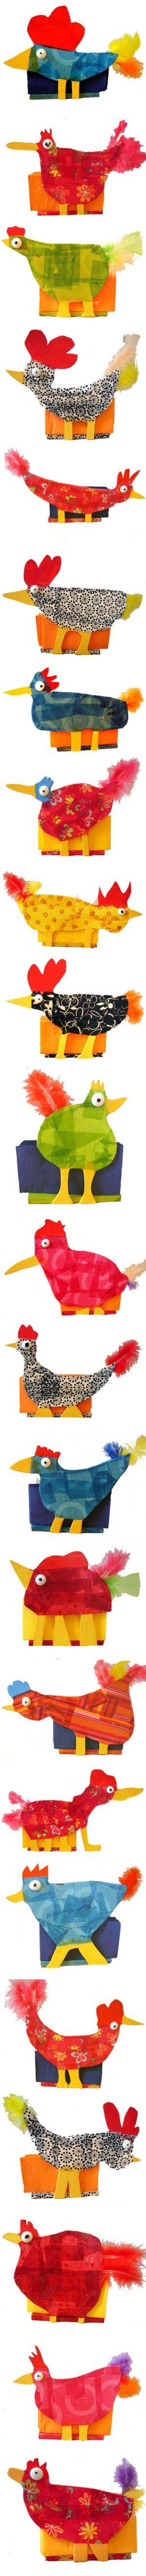 Tiny wren chickens